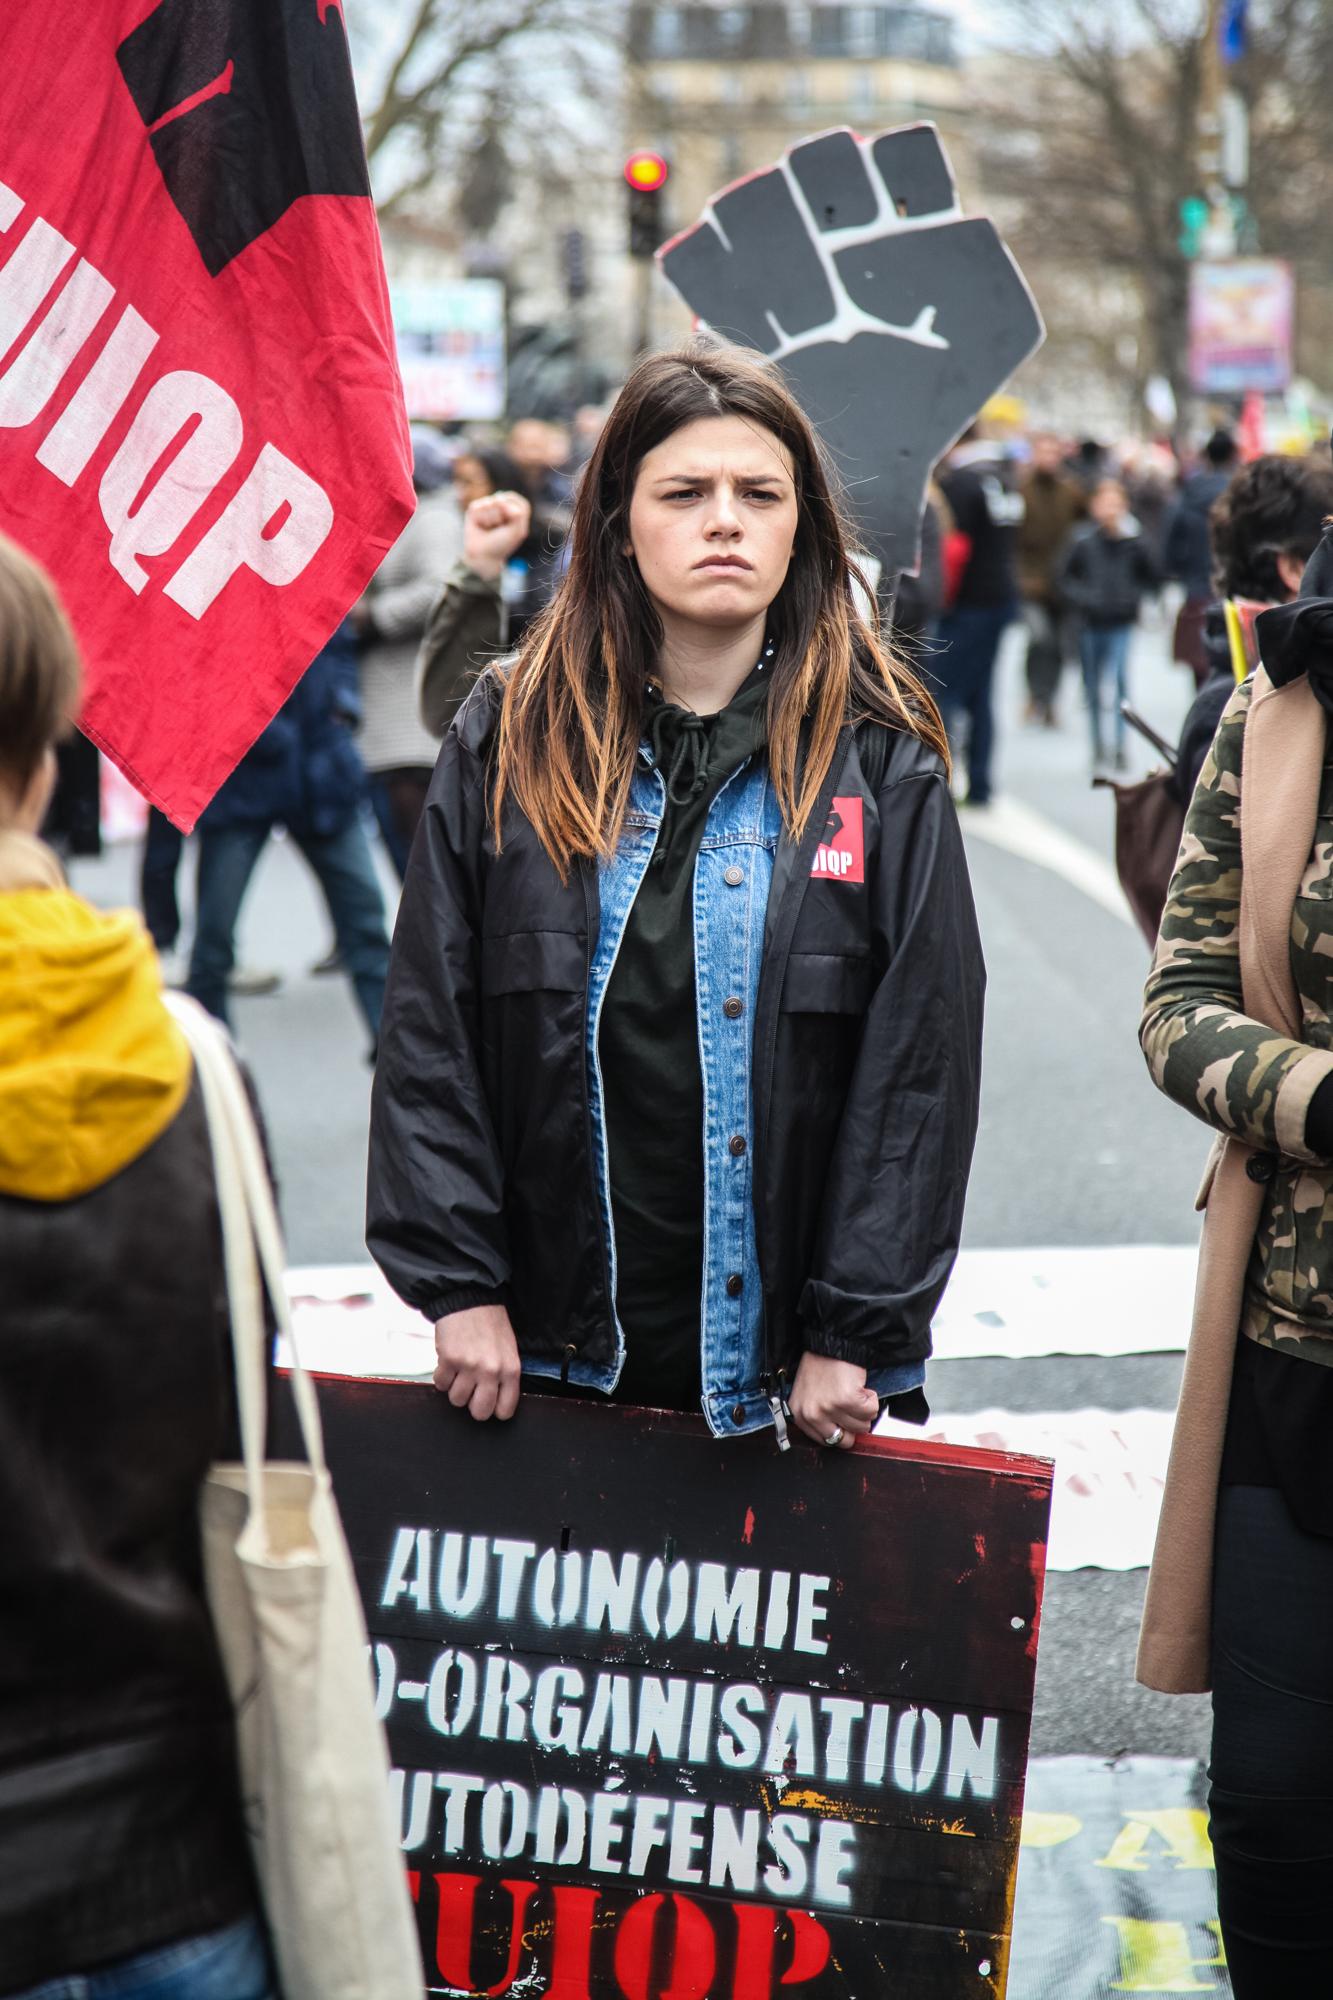 02-201703-MARCHE-CONTRE-VIOLENCES-POLICIERES©Augustin-Le_Gall-Haytham-Pictures-IMG_3495.jpg